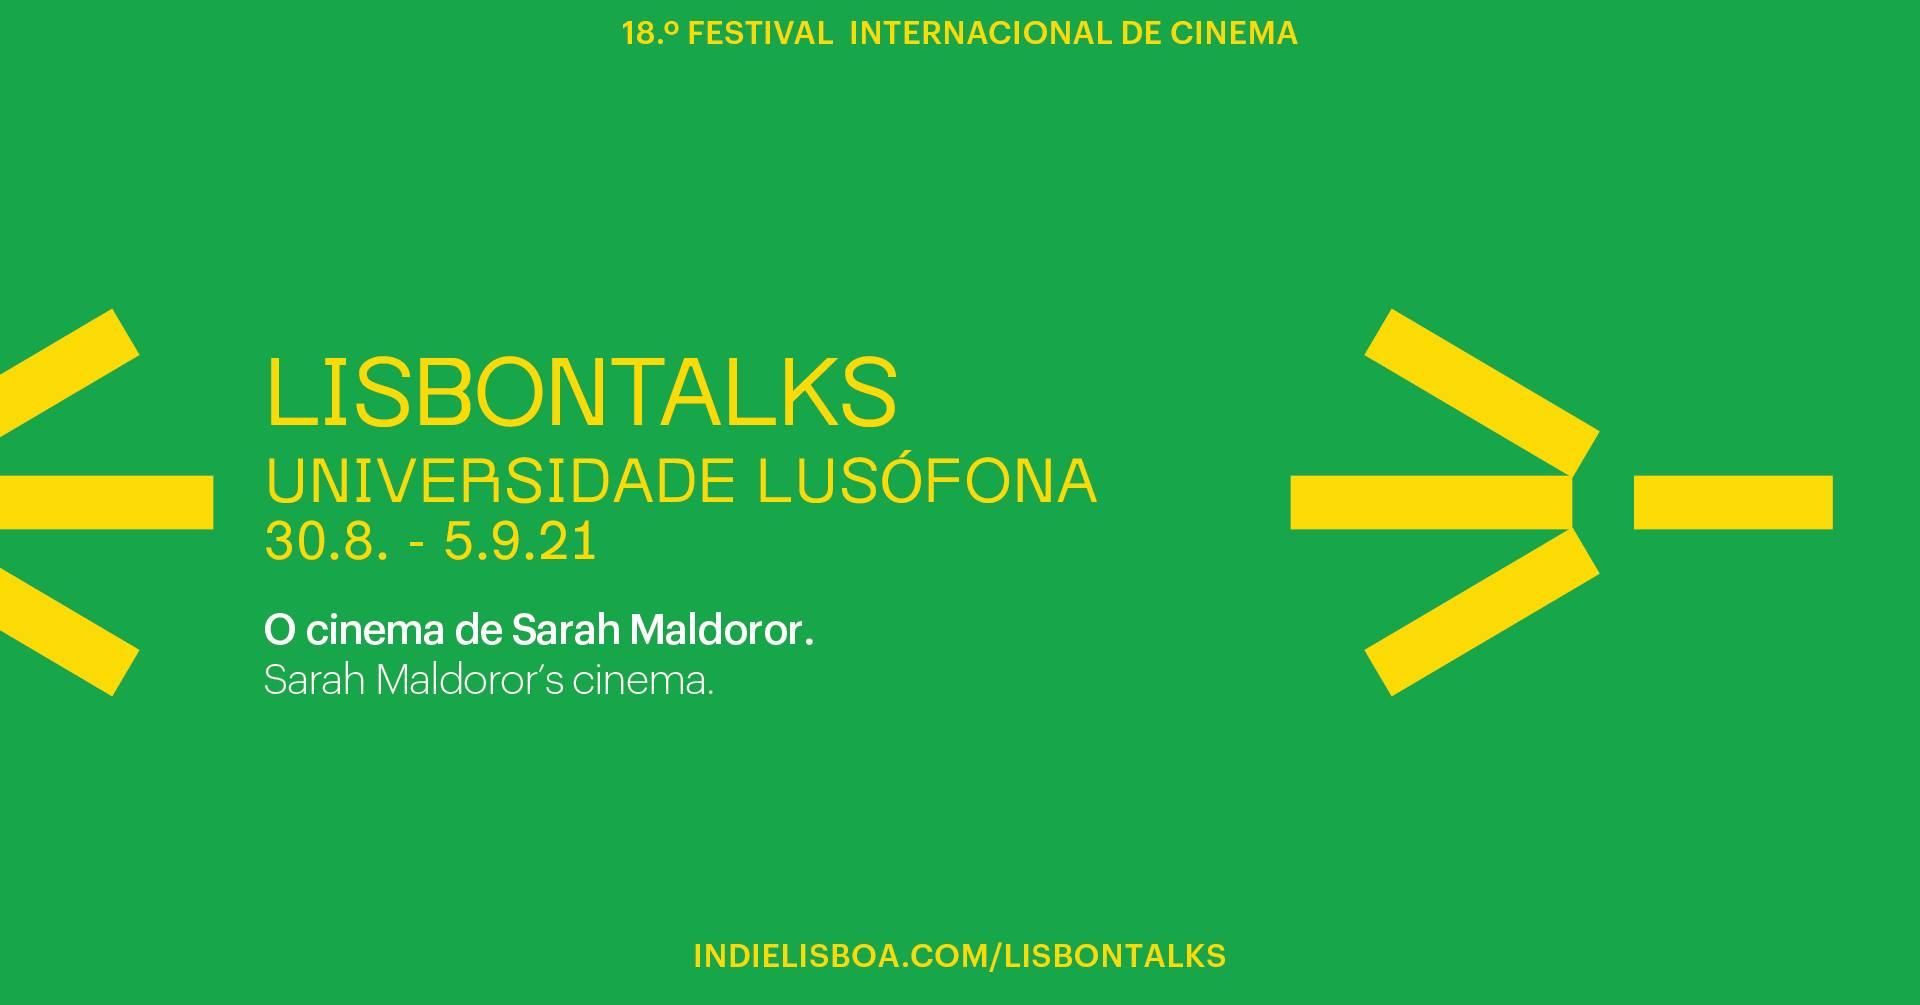 LisbonTalks - O cinema de Sarah Maldoror